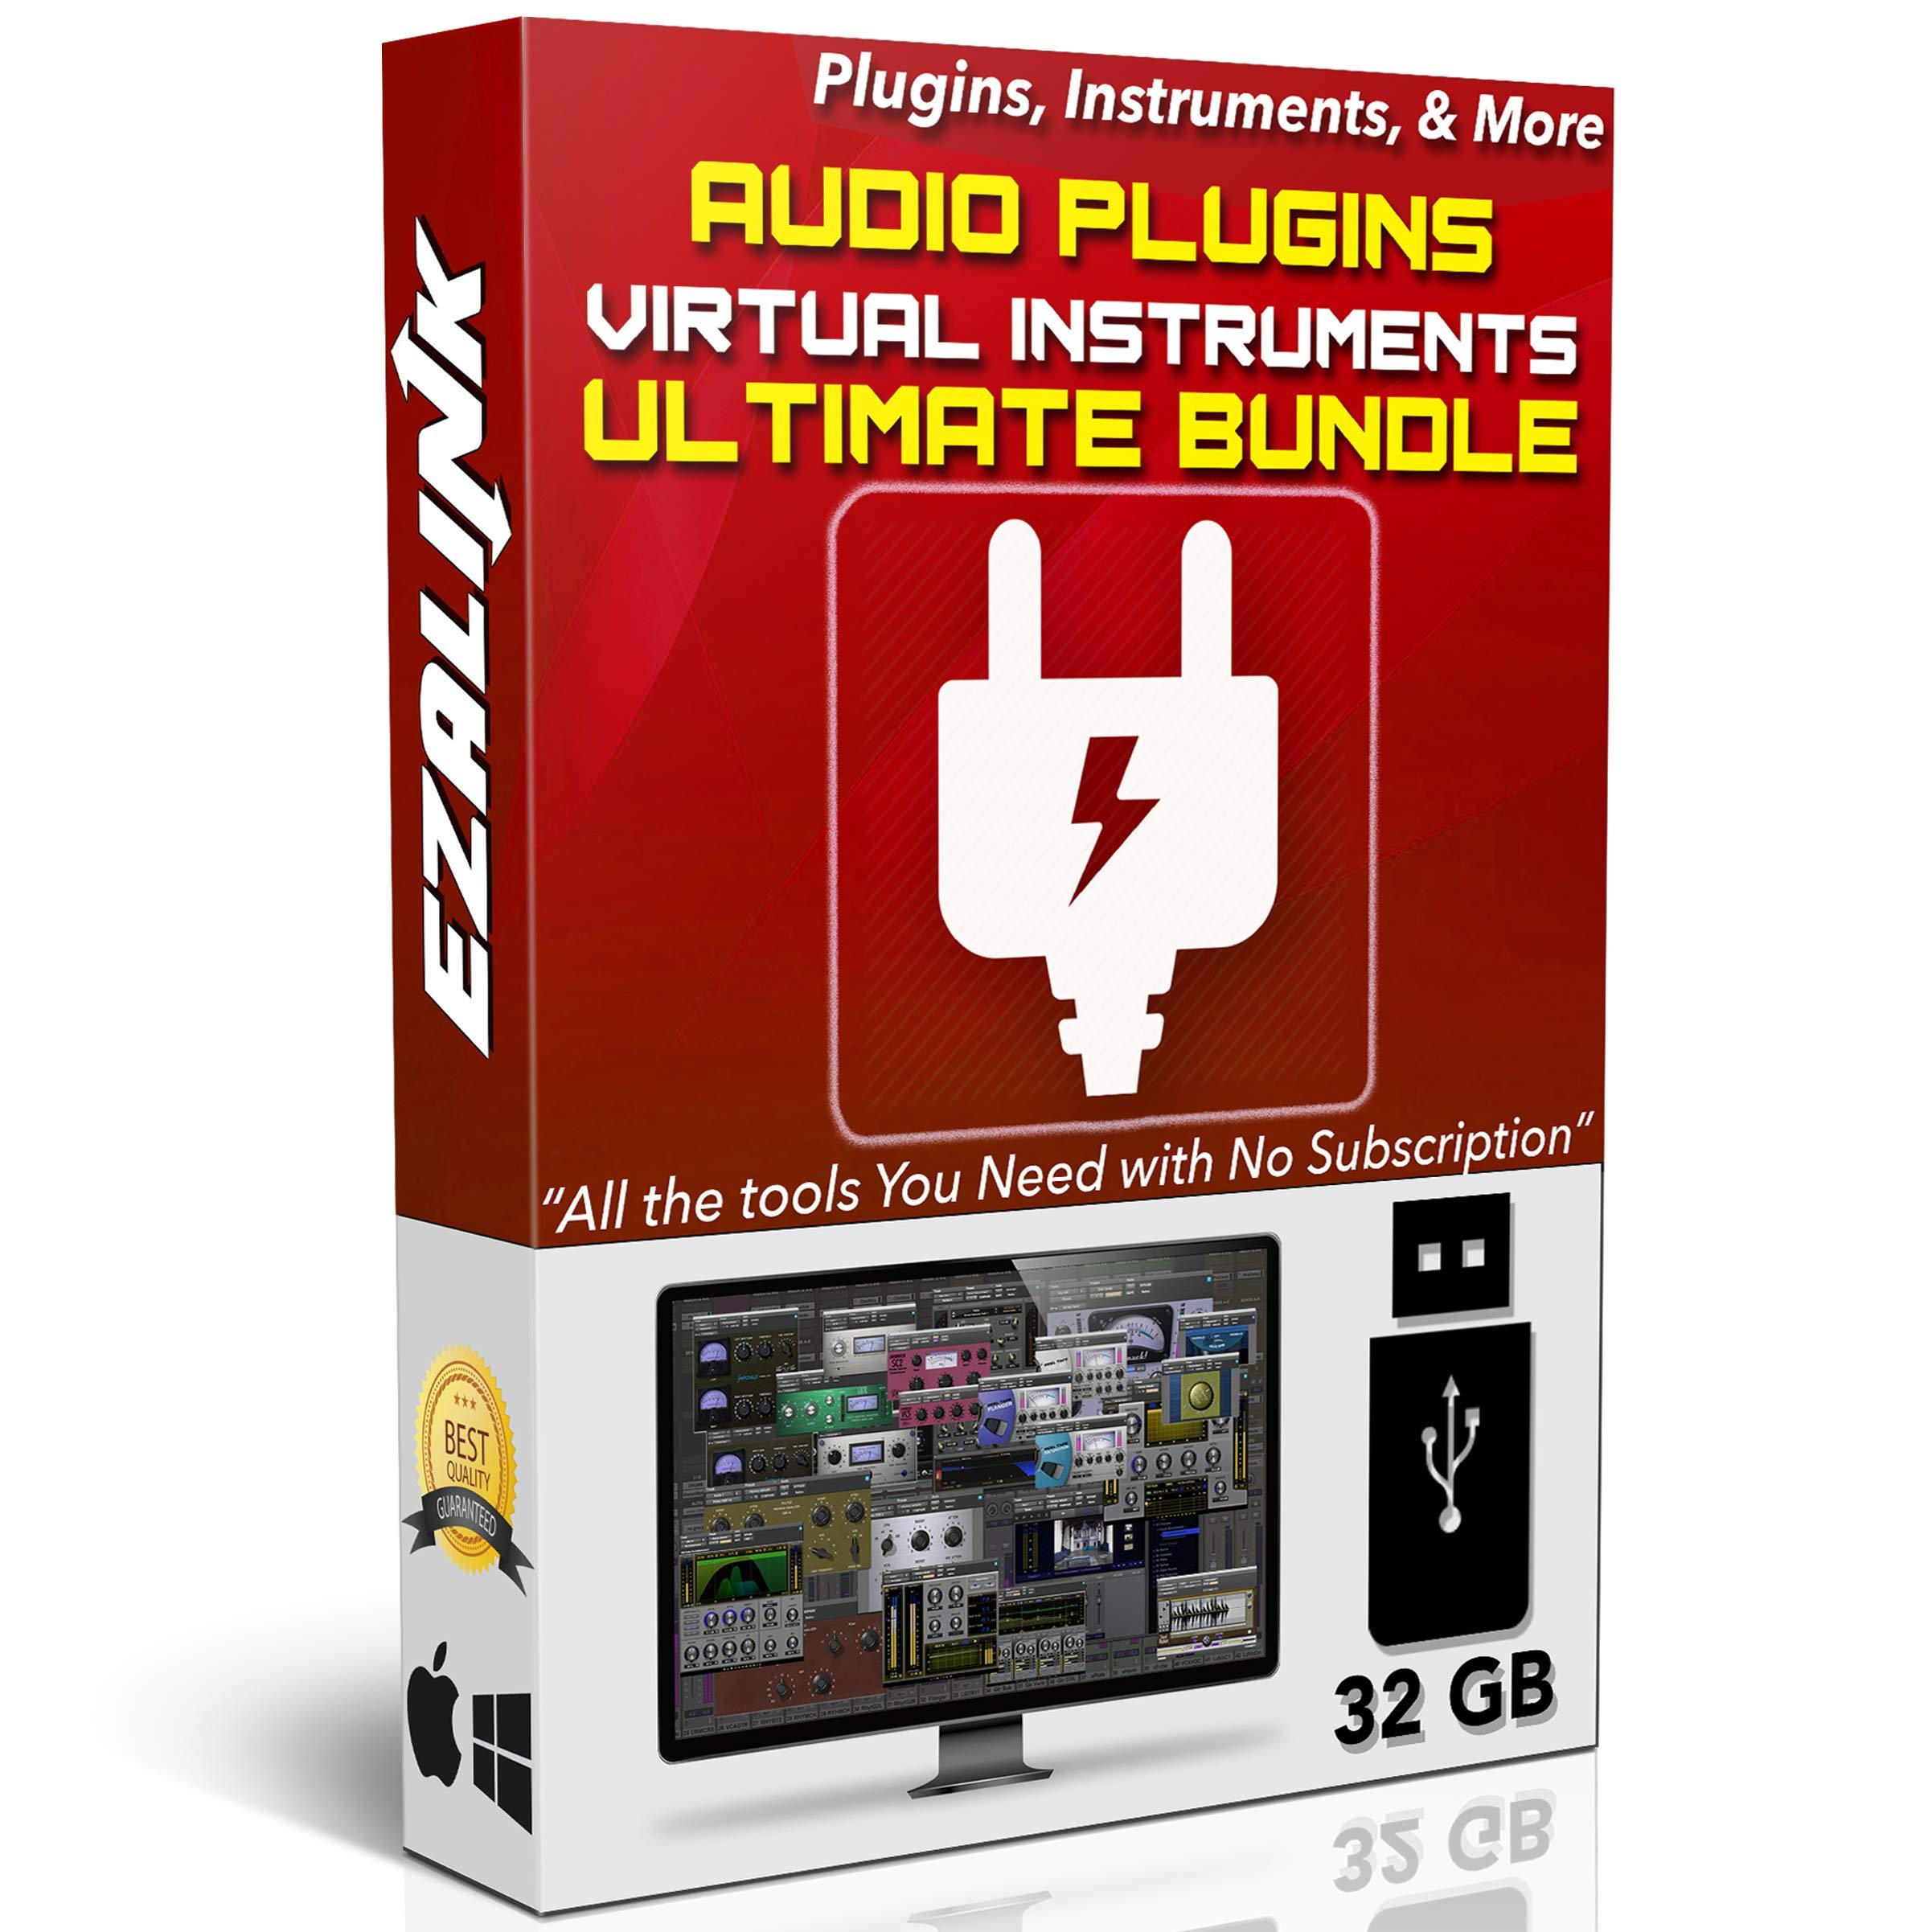 Audio Plugins Bundle for Software VST AU AAX Music Synth Delay Virtual Instruments Windows & MAC for FL Studio, Ableton Live, Pro Tools, Cubase etc. (32Gb USB) by Ultimate Audio Plugins Bundle